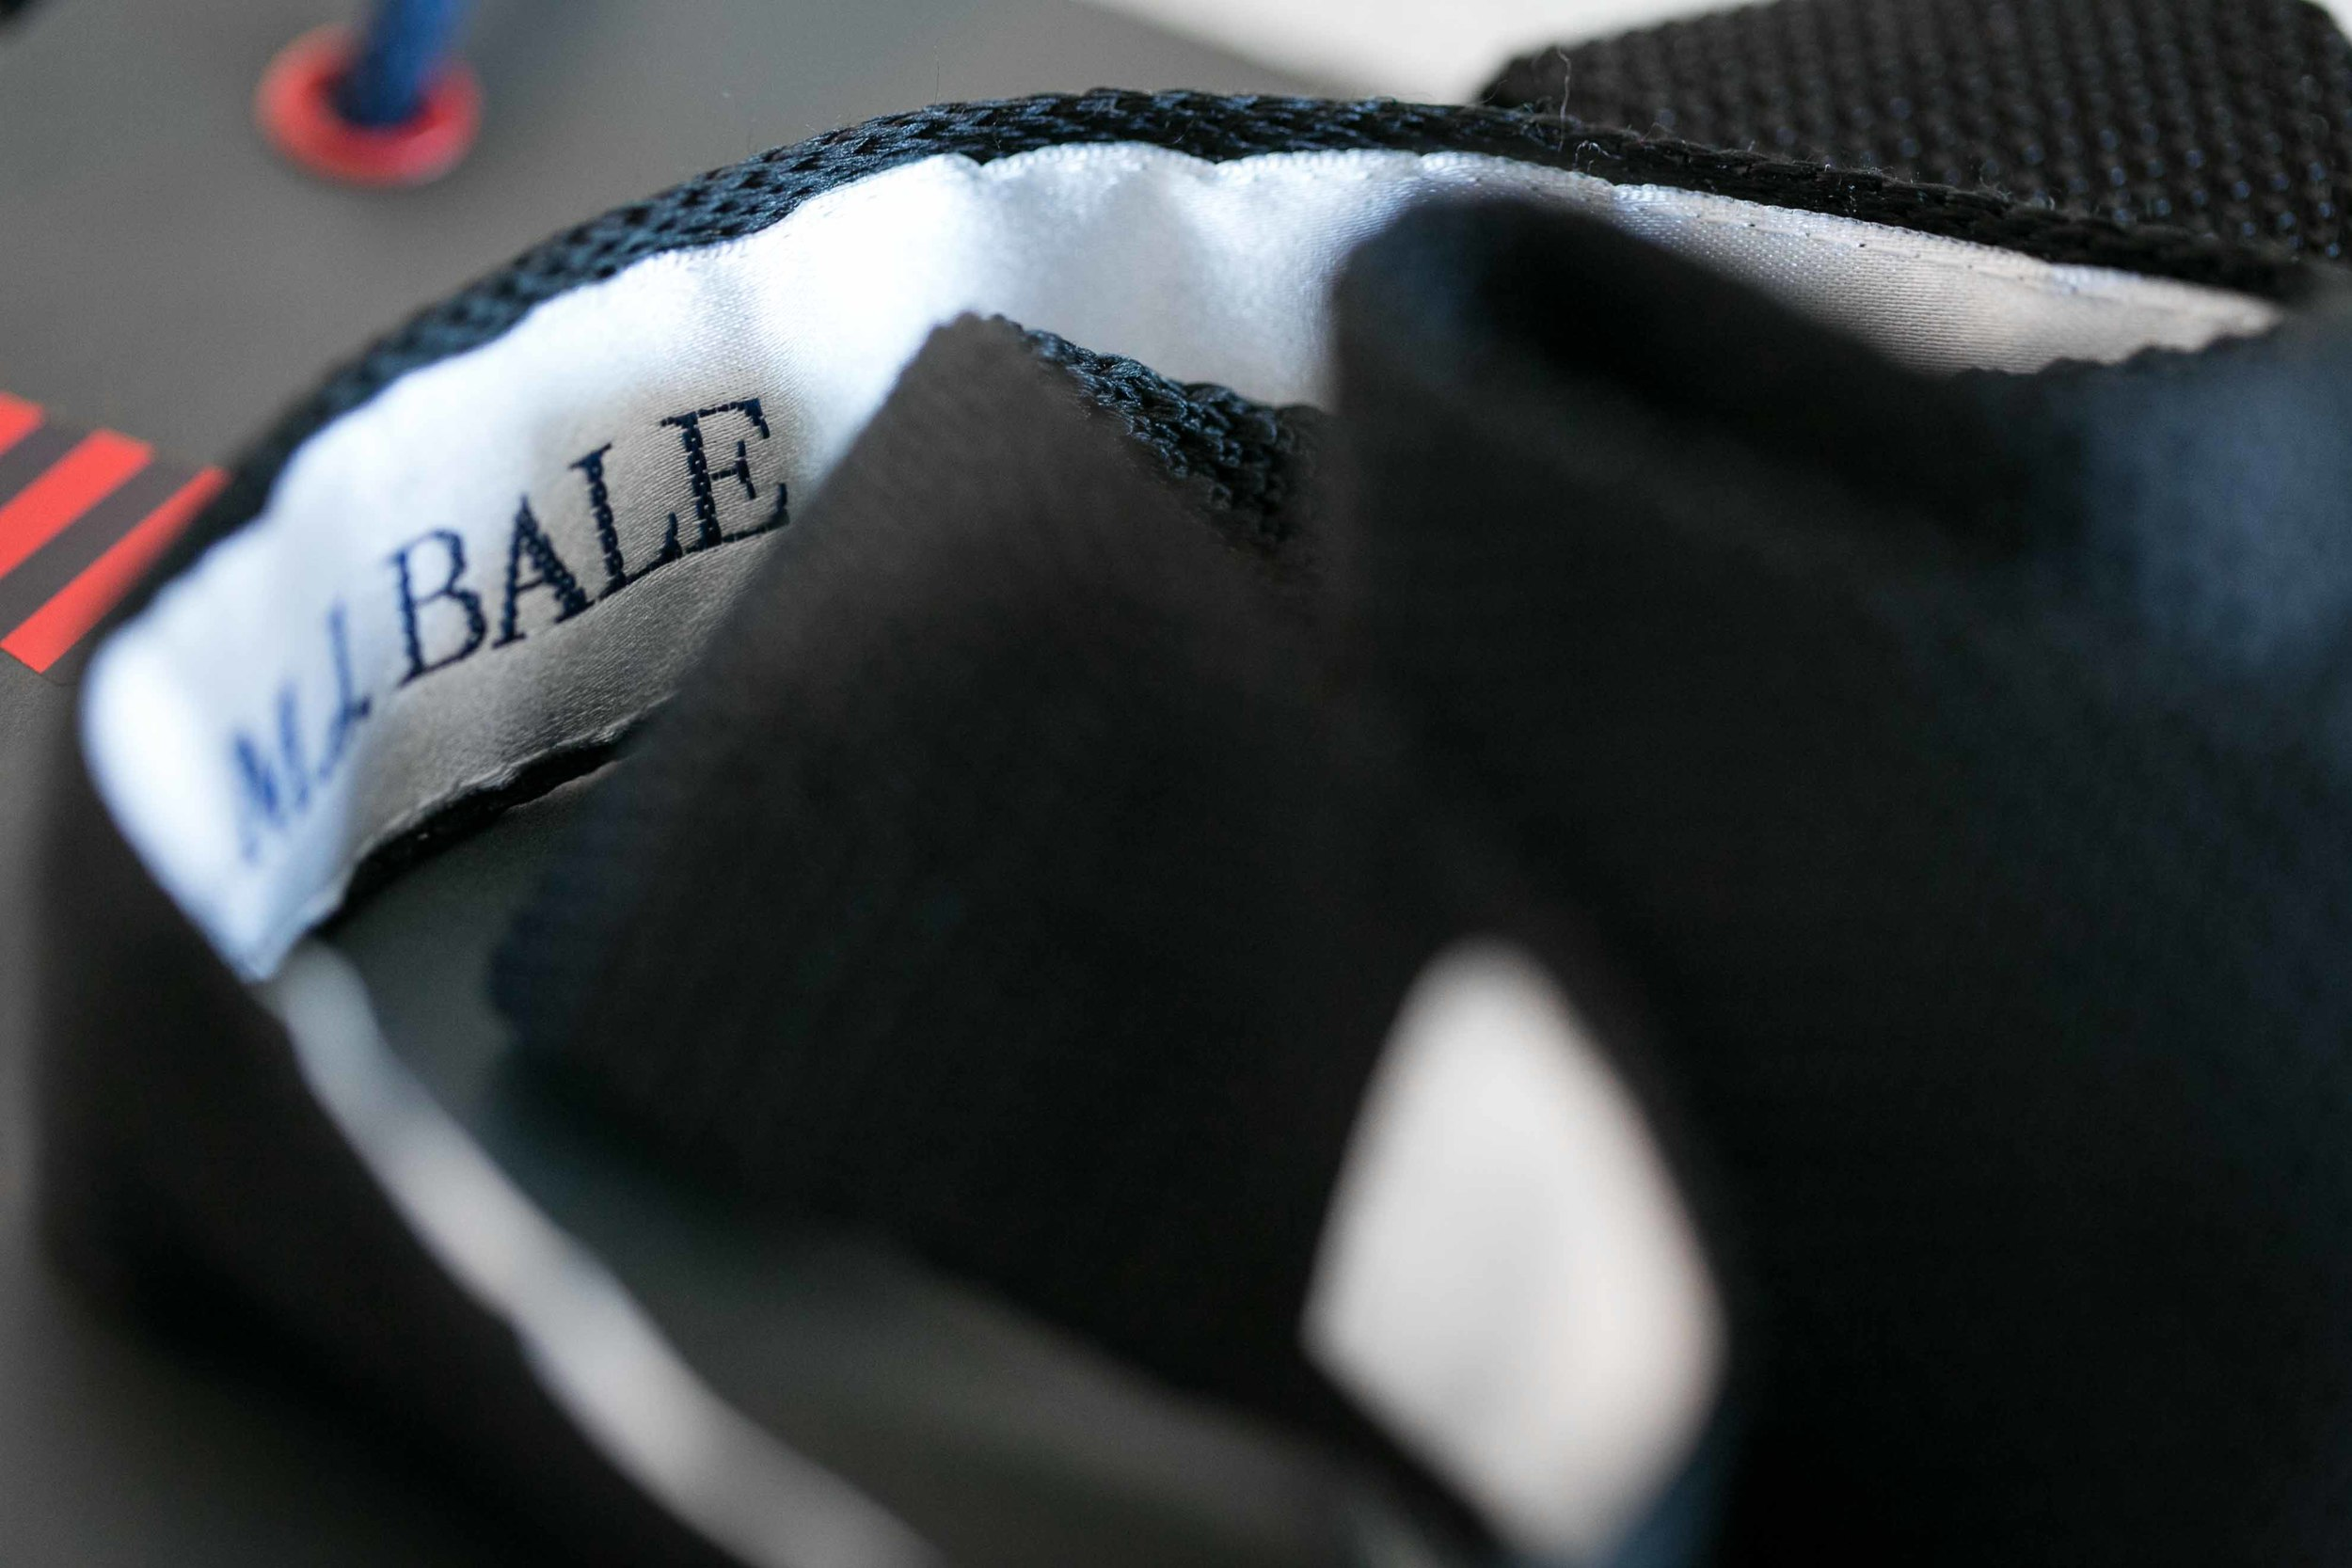 MJ Bale Knitted Silk Tie